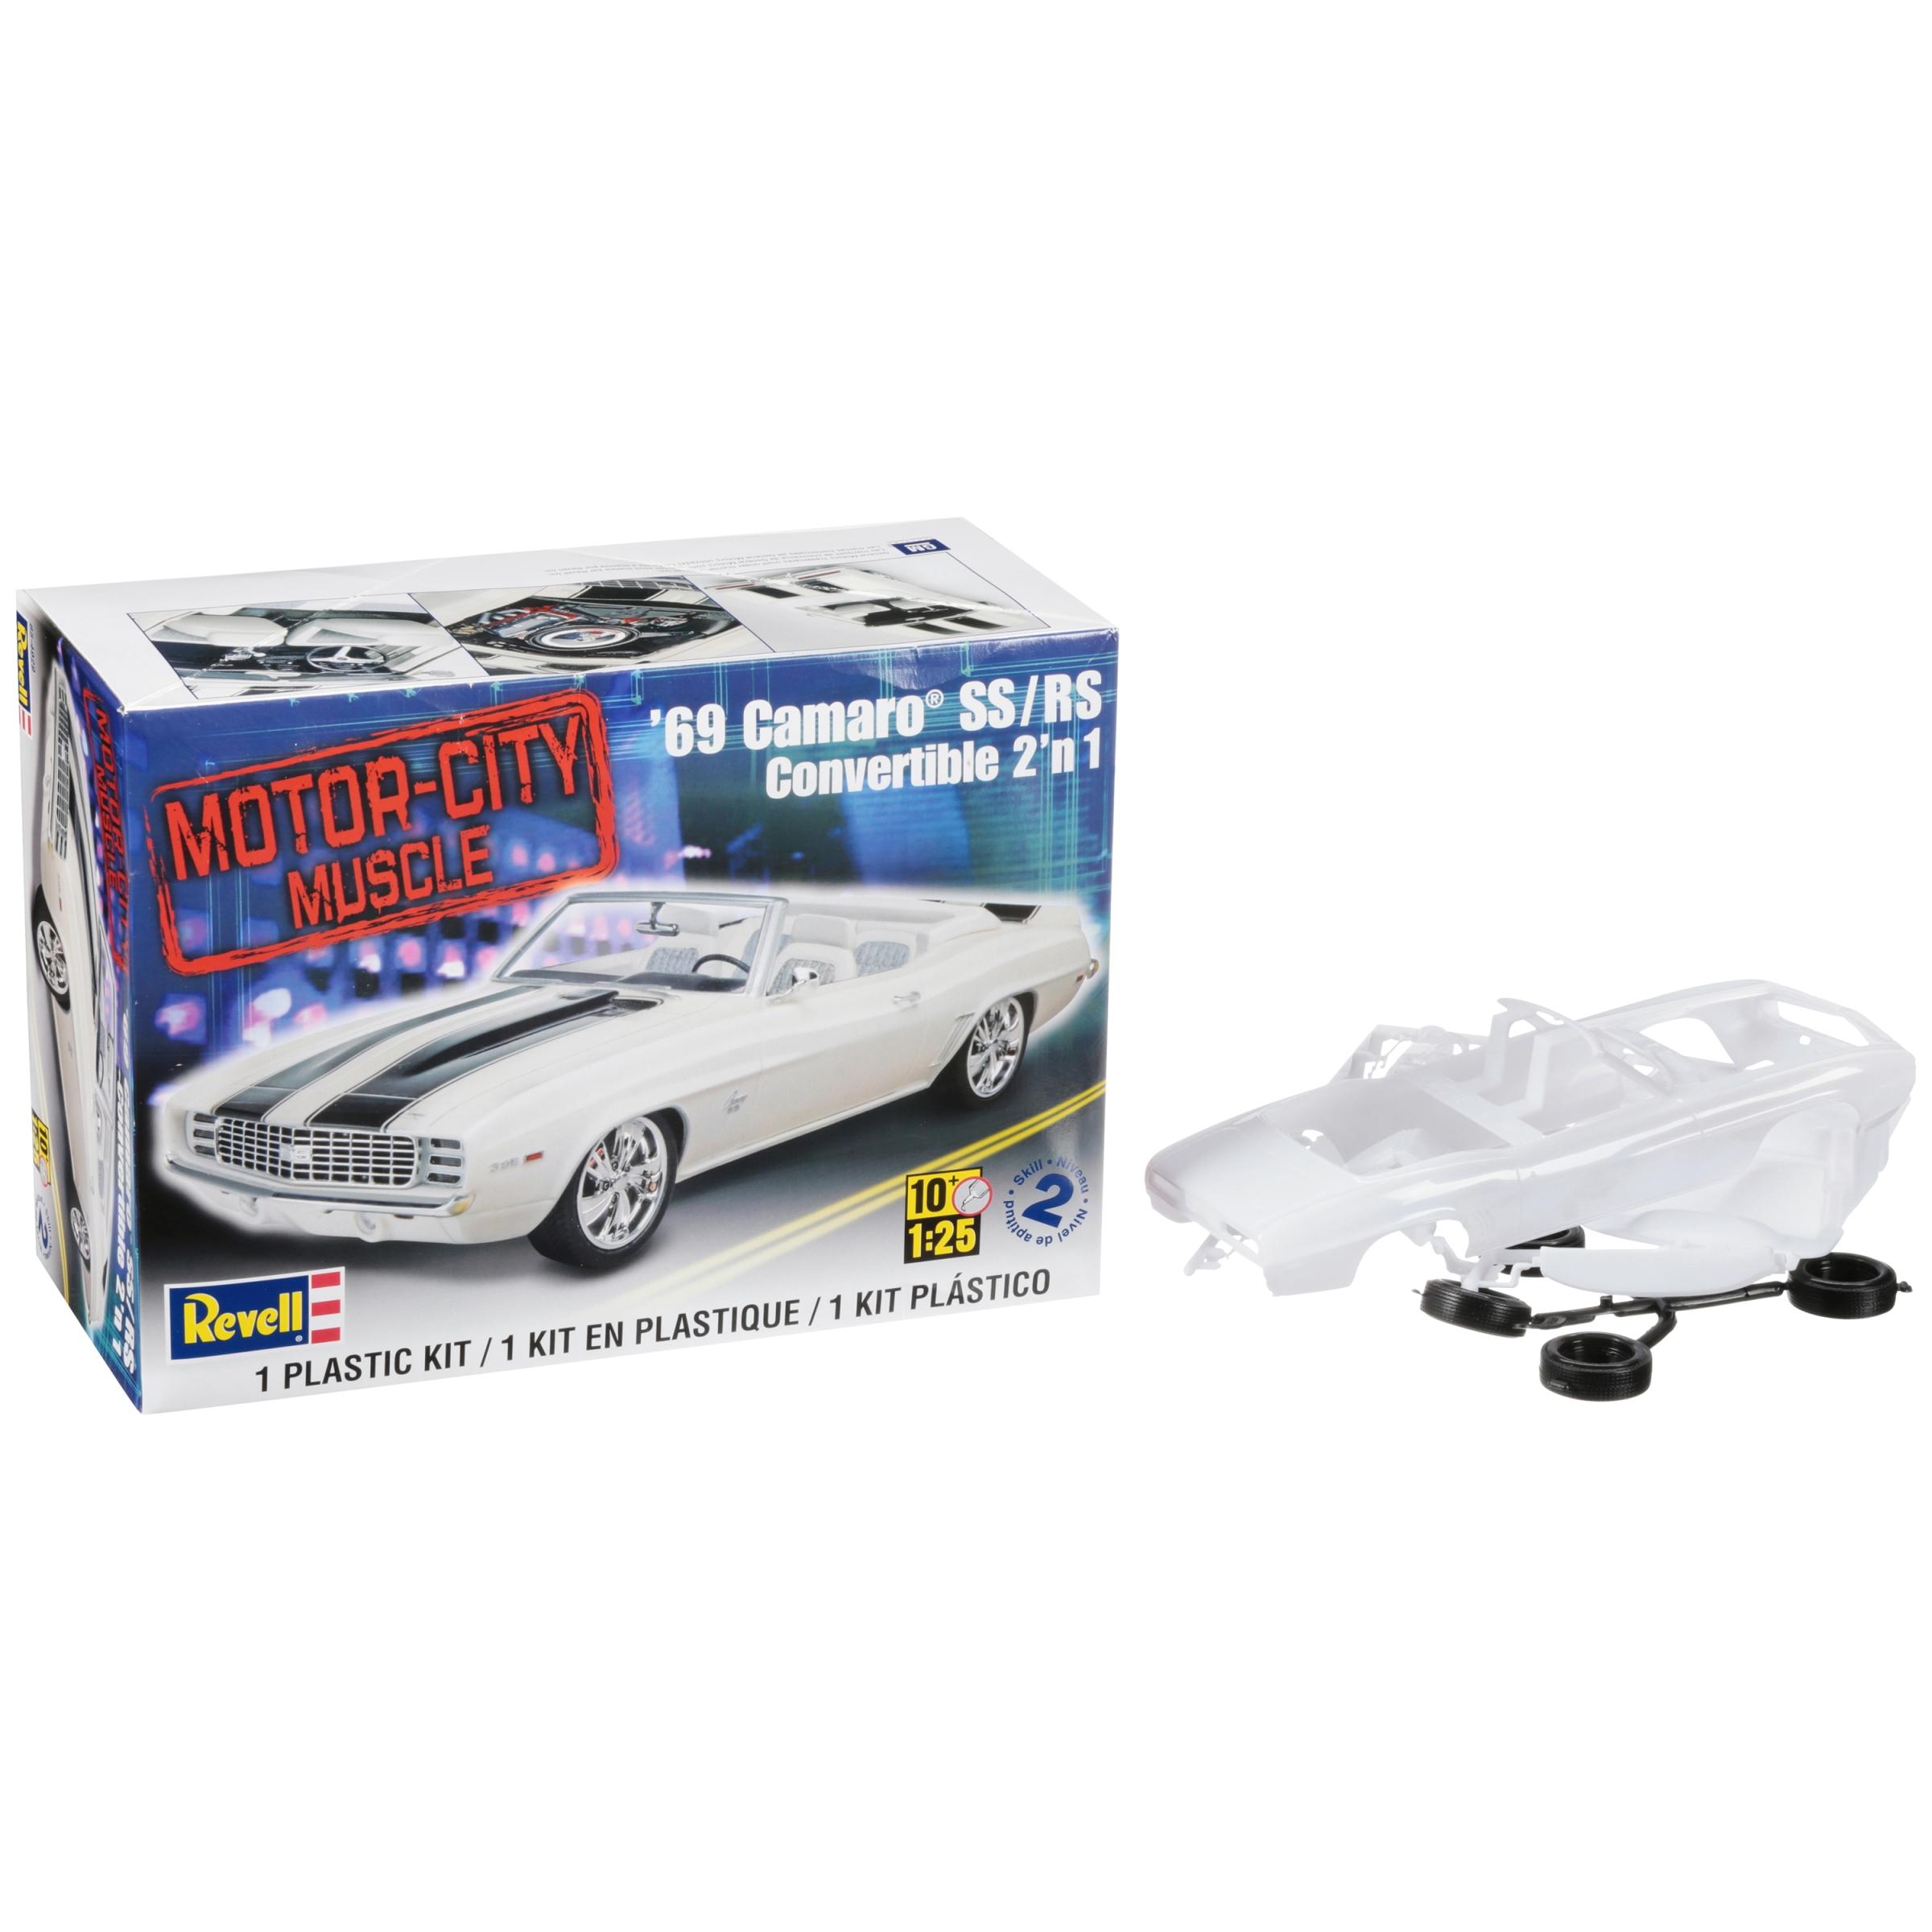 Revell® Motor-City Muscle '69 Camaro® SS/RS Convertible 2'N 1 Plastic Model Car Kit 114 pc Box